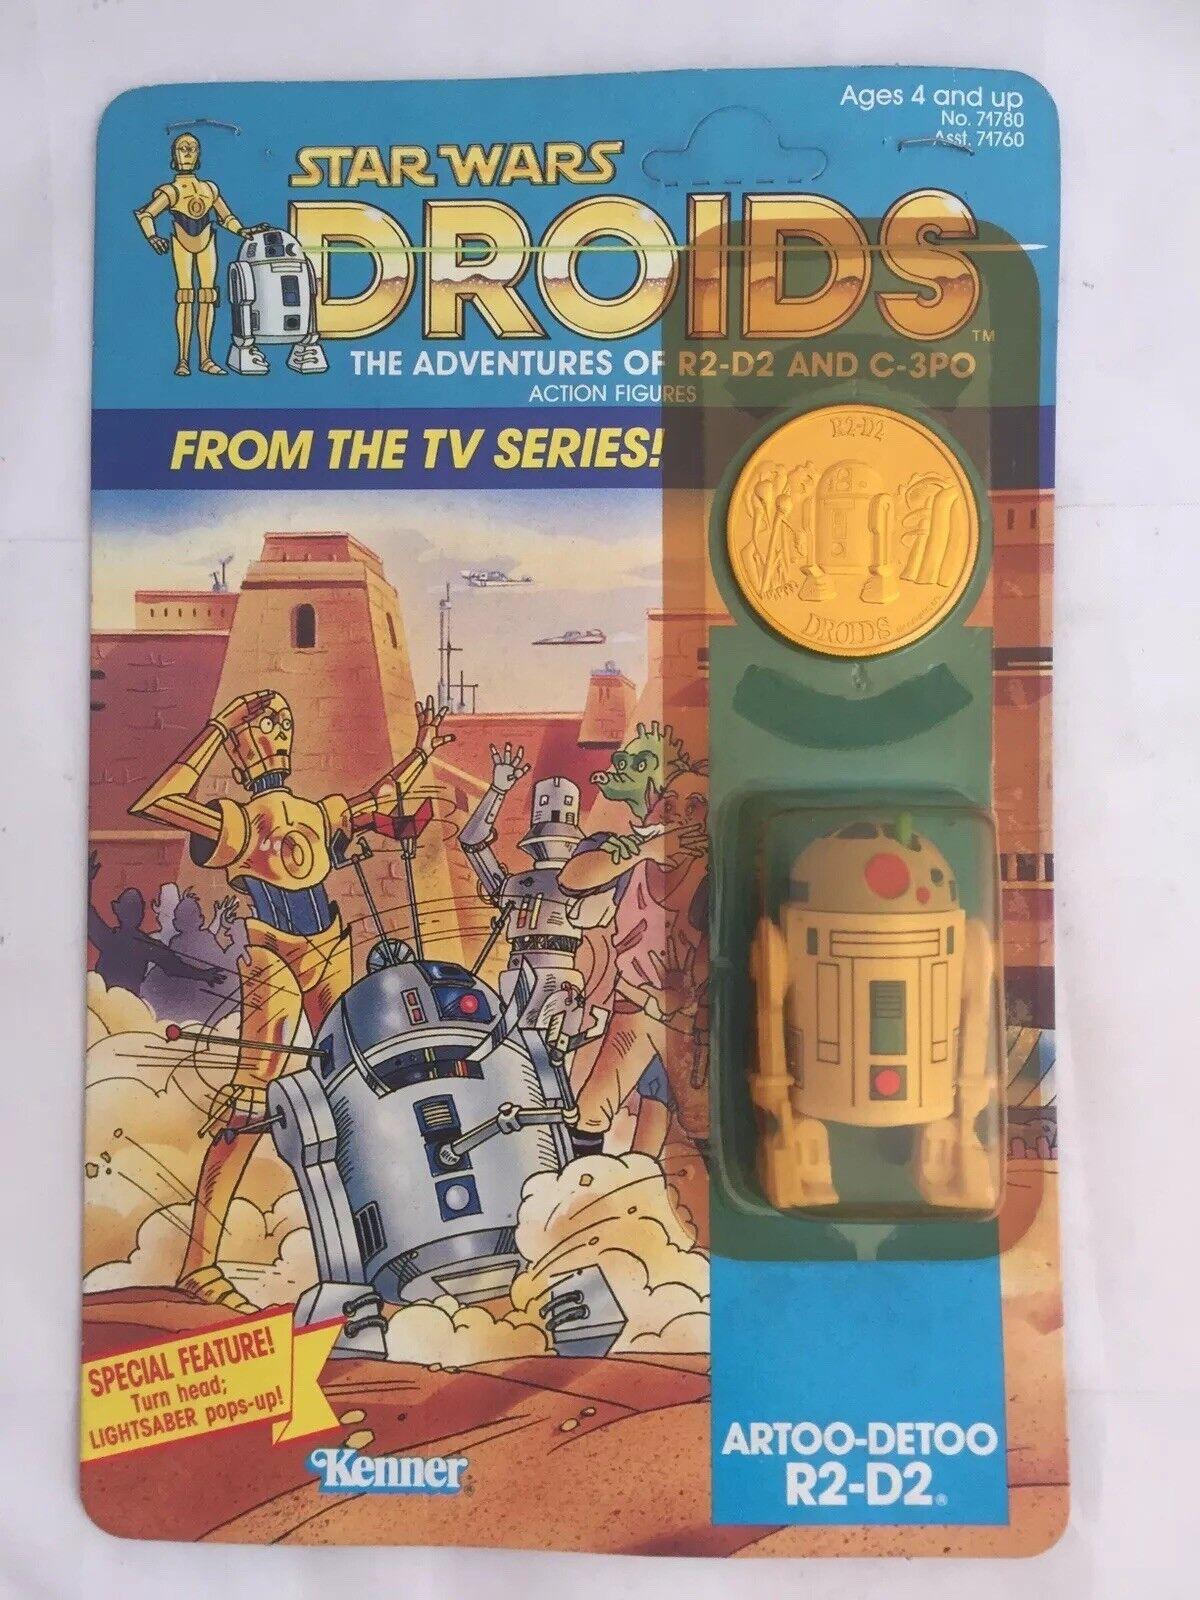 VINTAGE Star Wars Droidi R2D2 Pop Up Toy Action Figure MOC noi KENNER USA 1985